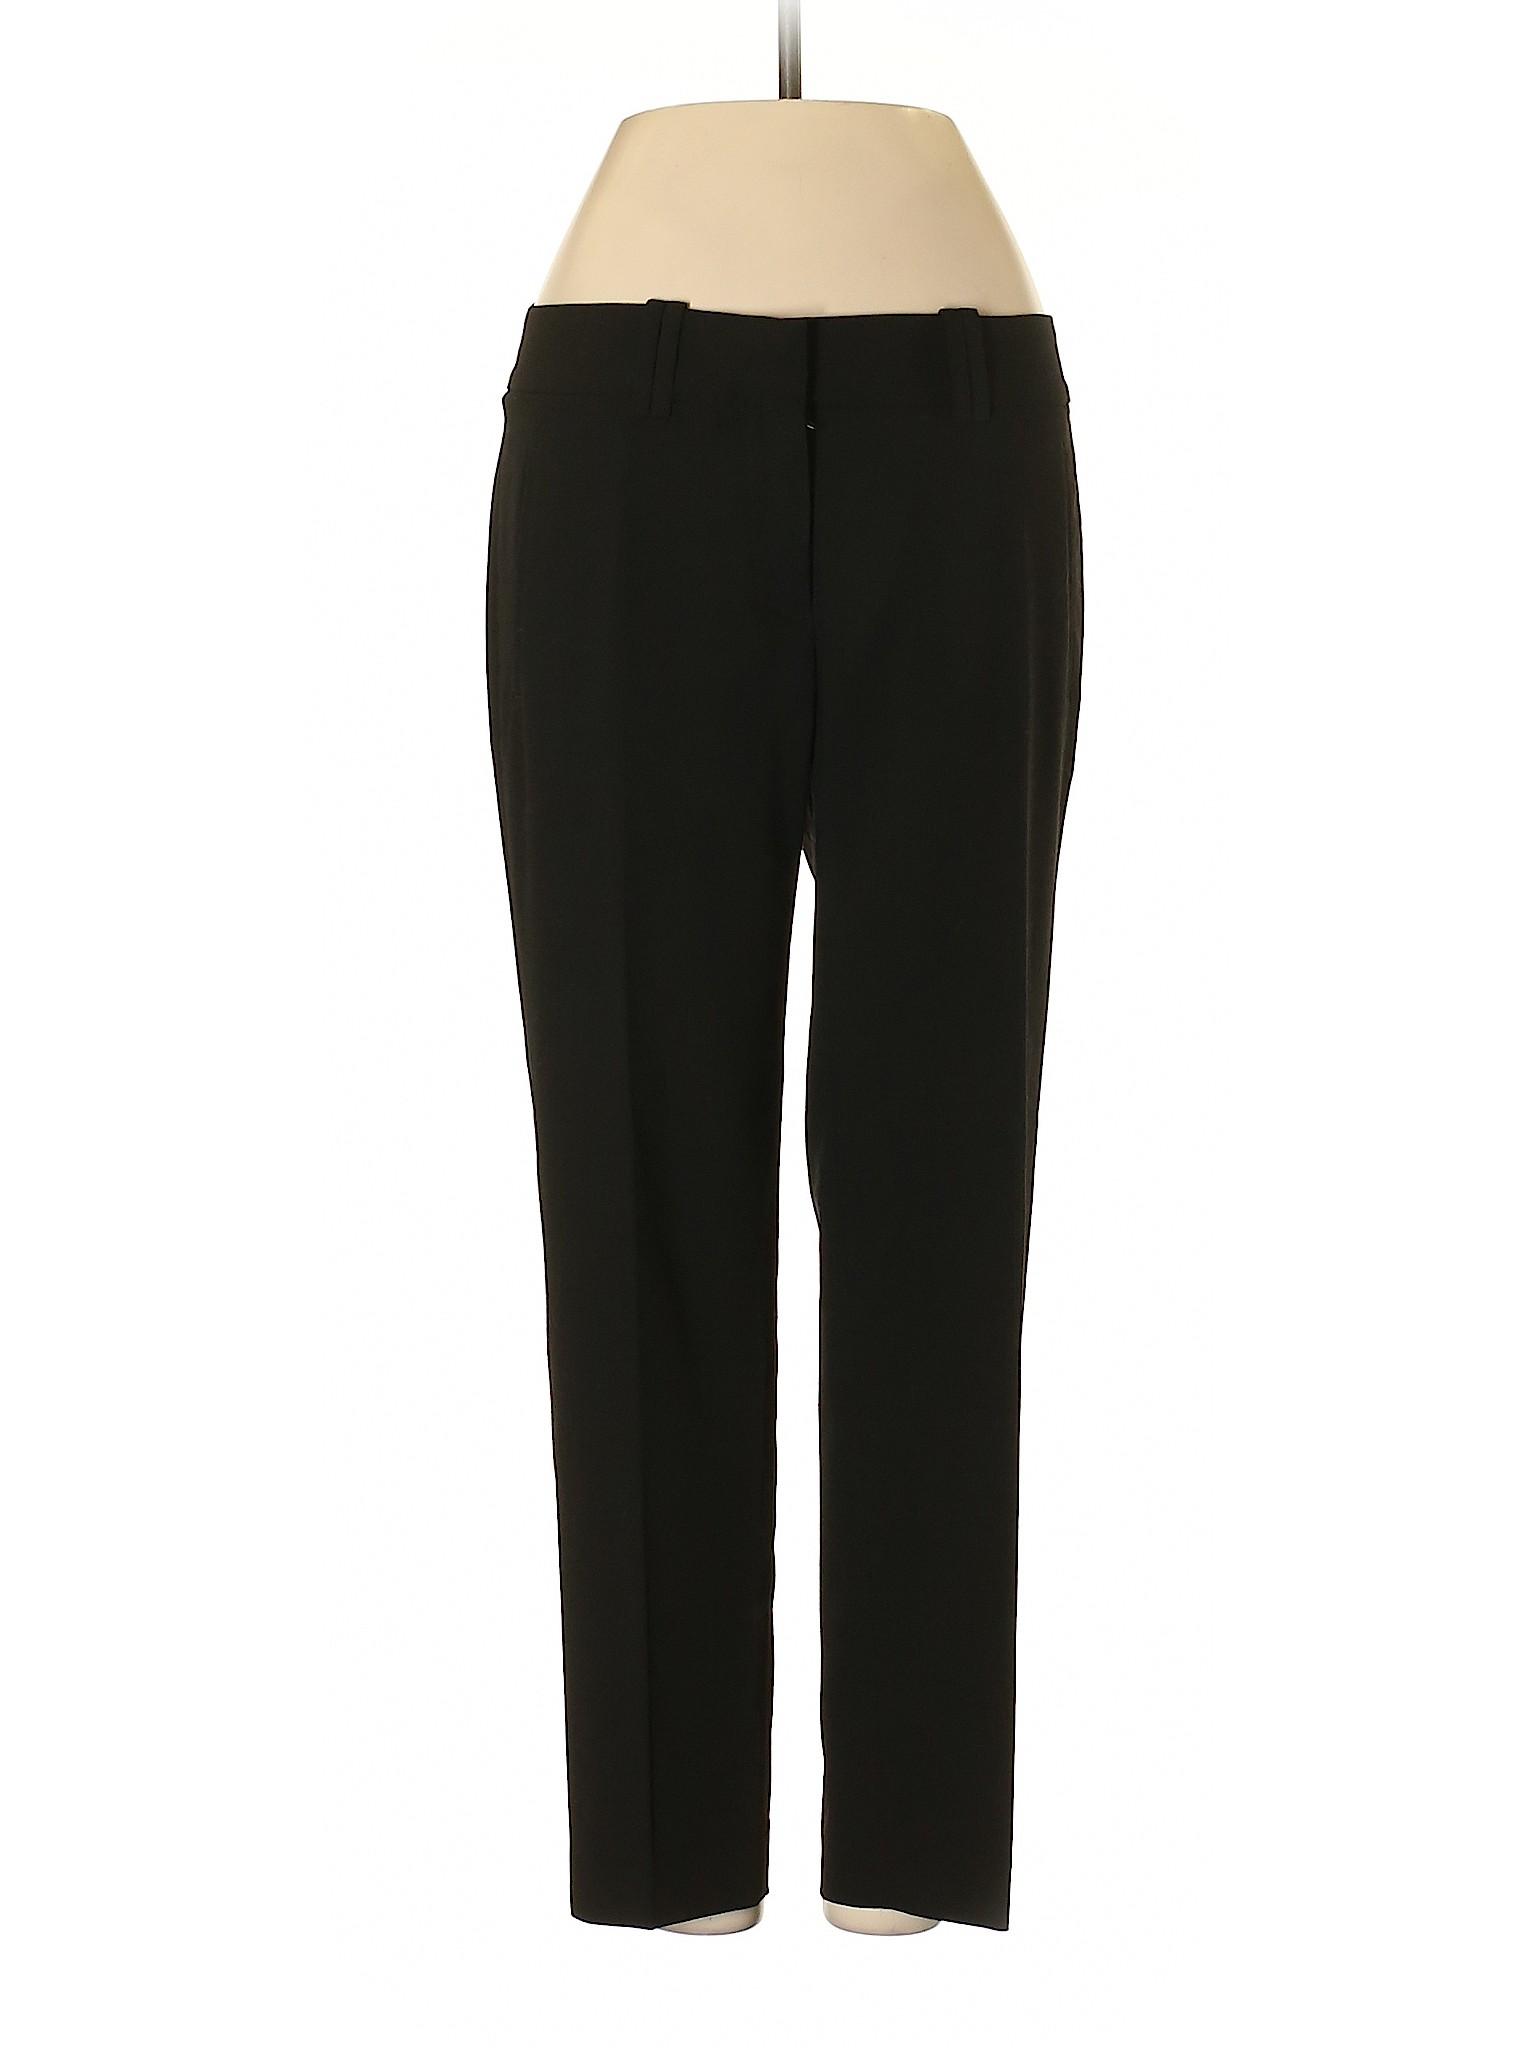 88968cdb Details about Zara Women Black Dress Pants 2